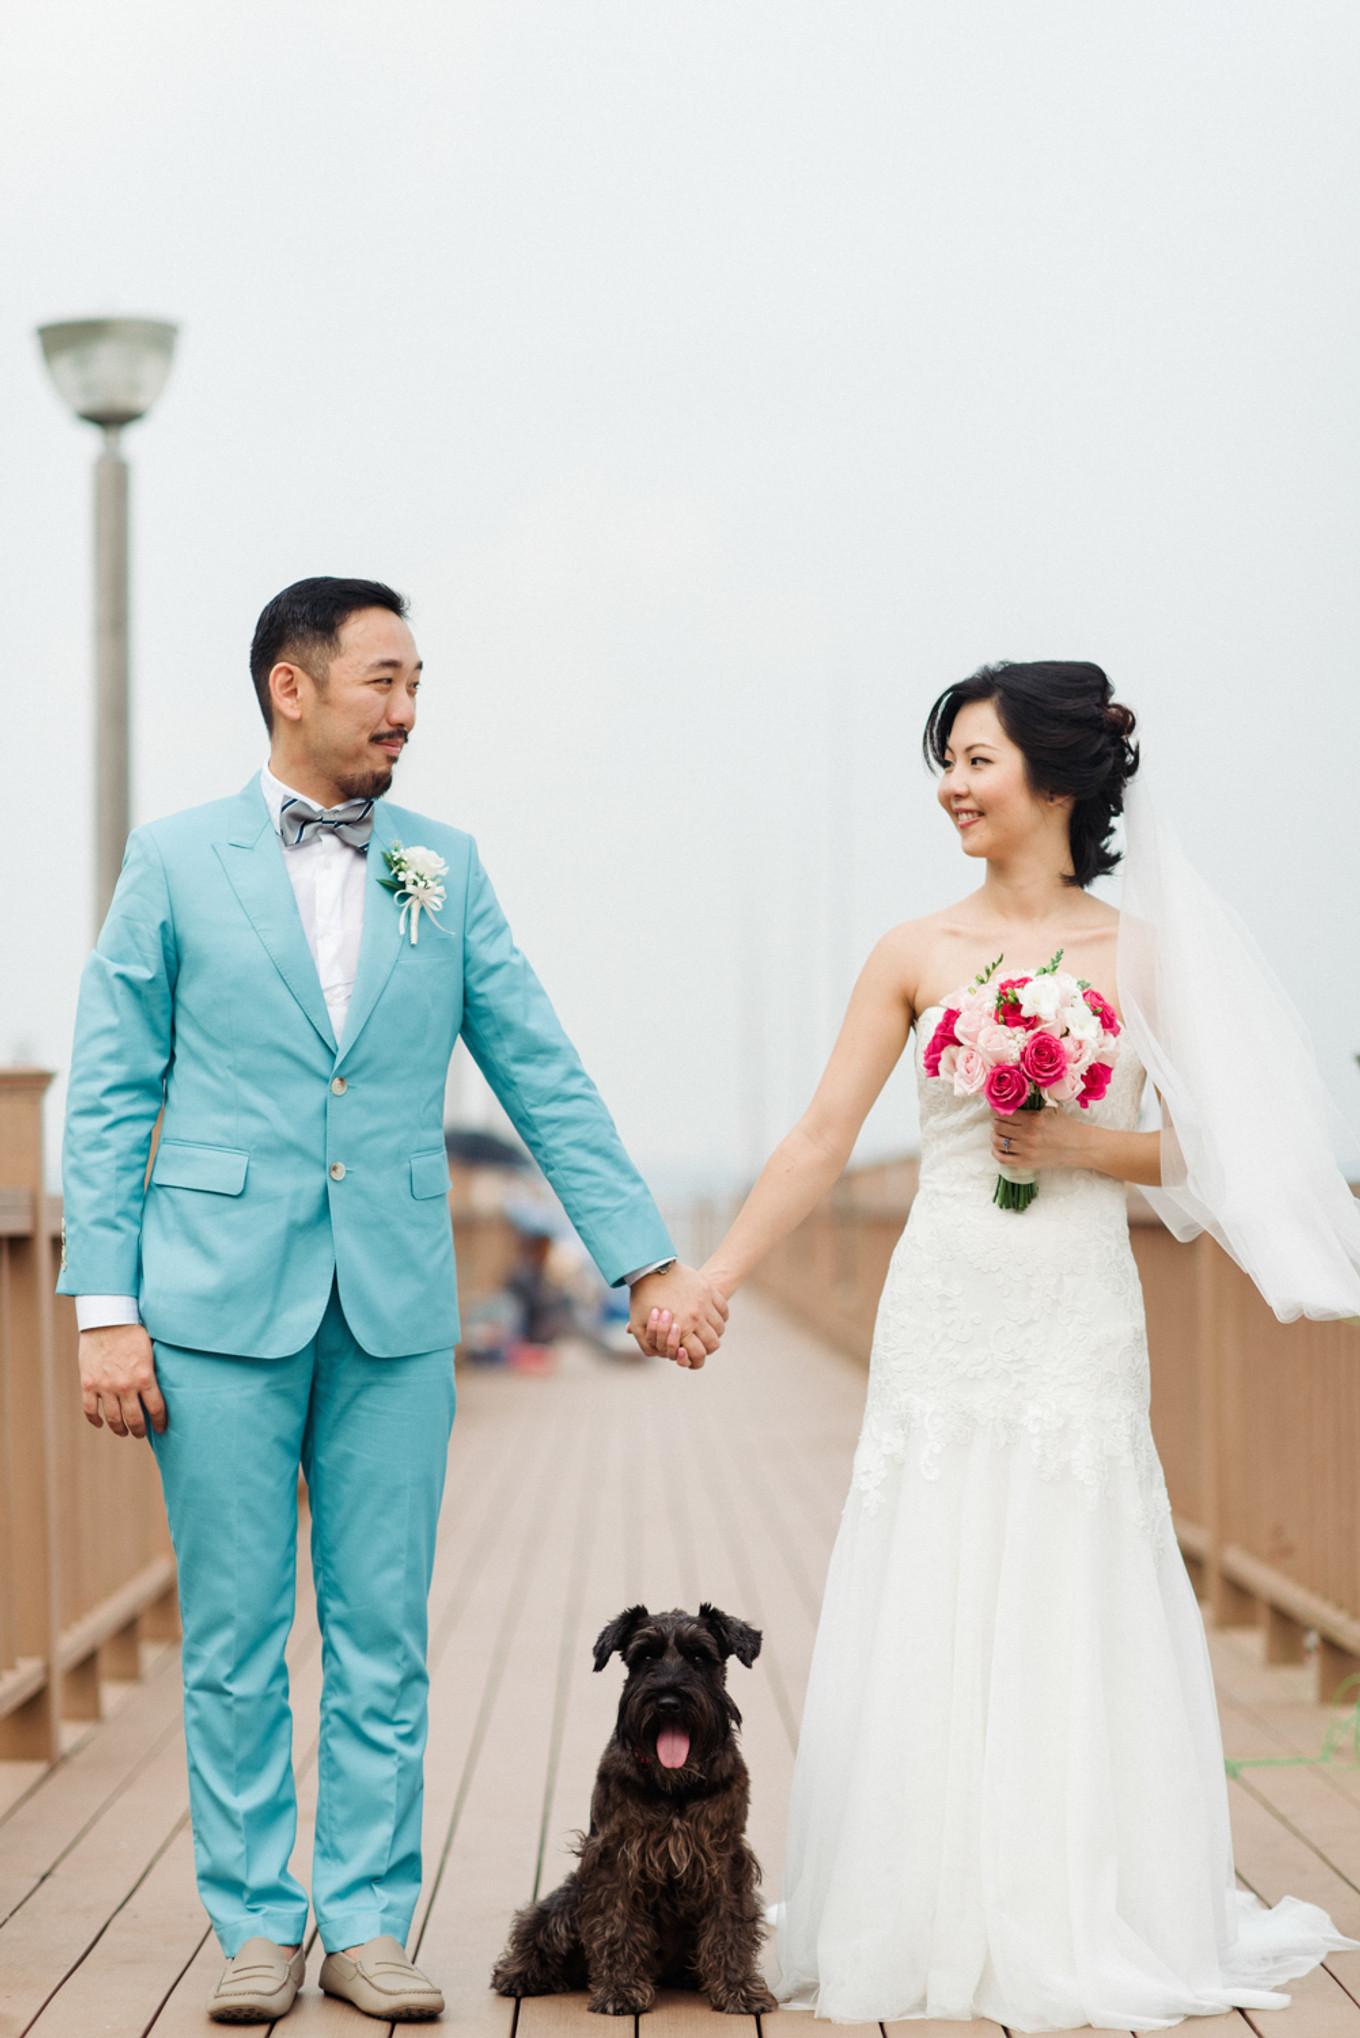 Jocelyn gailliot wedding